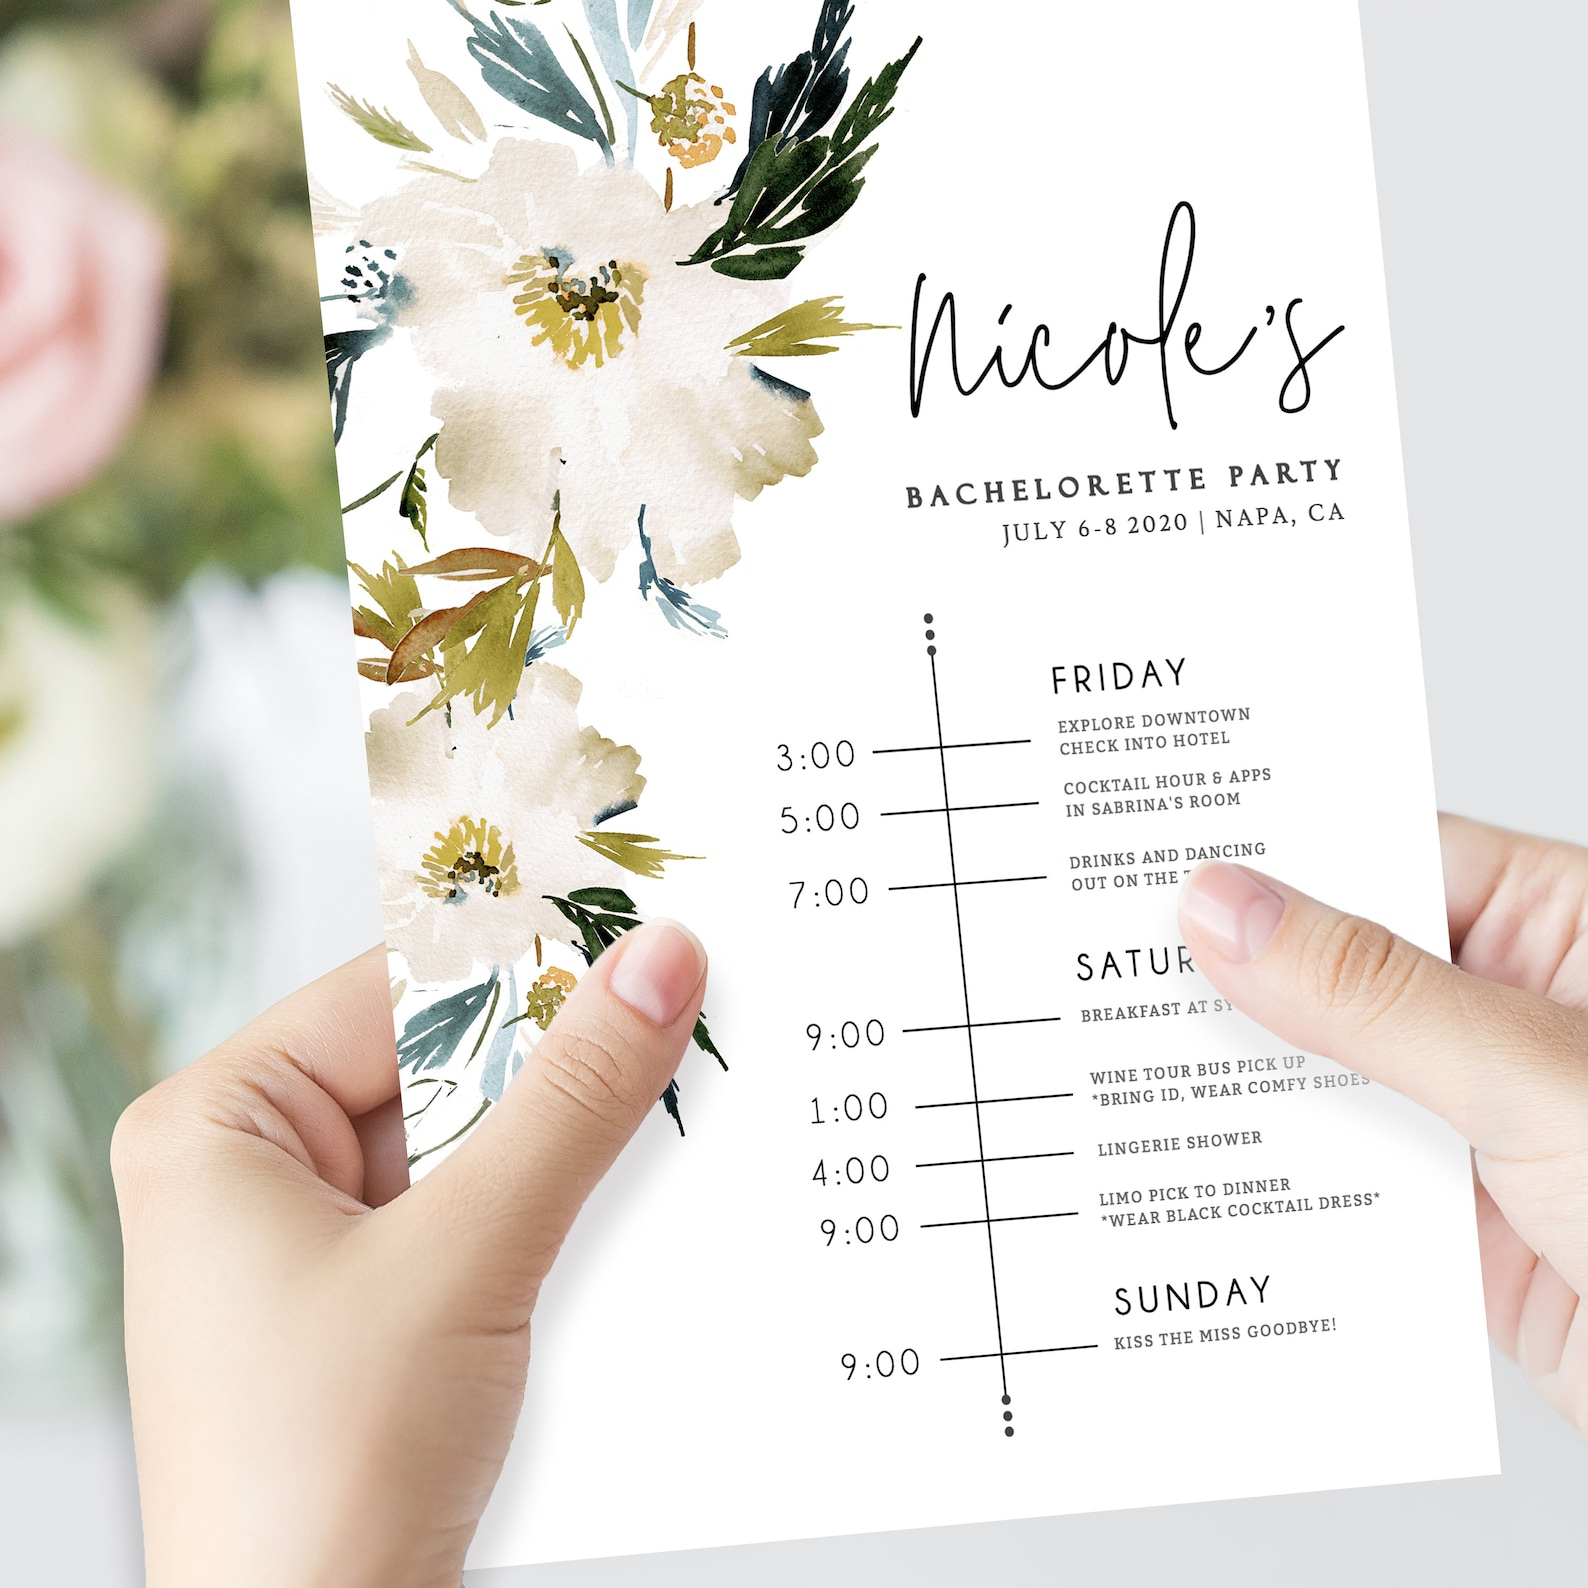 Free Bachelorette Weekend Itinerary Template